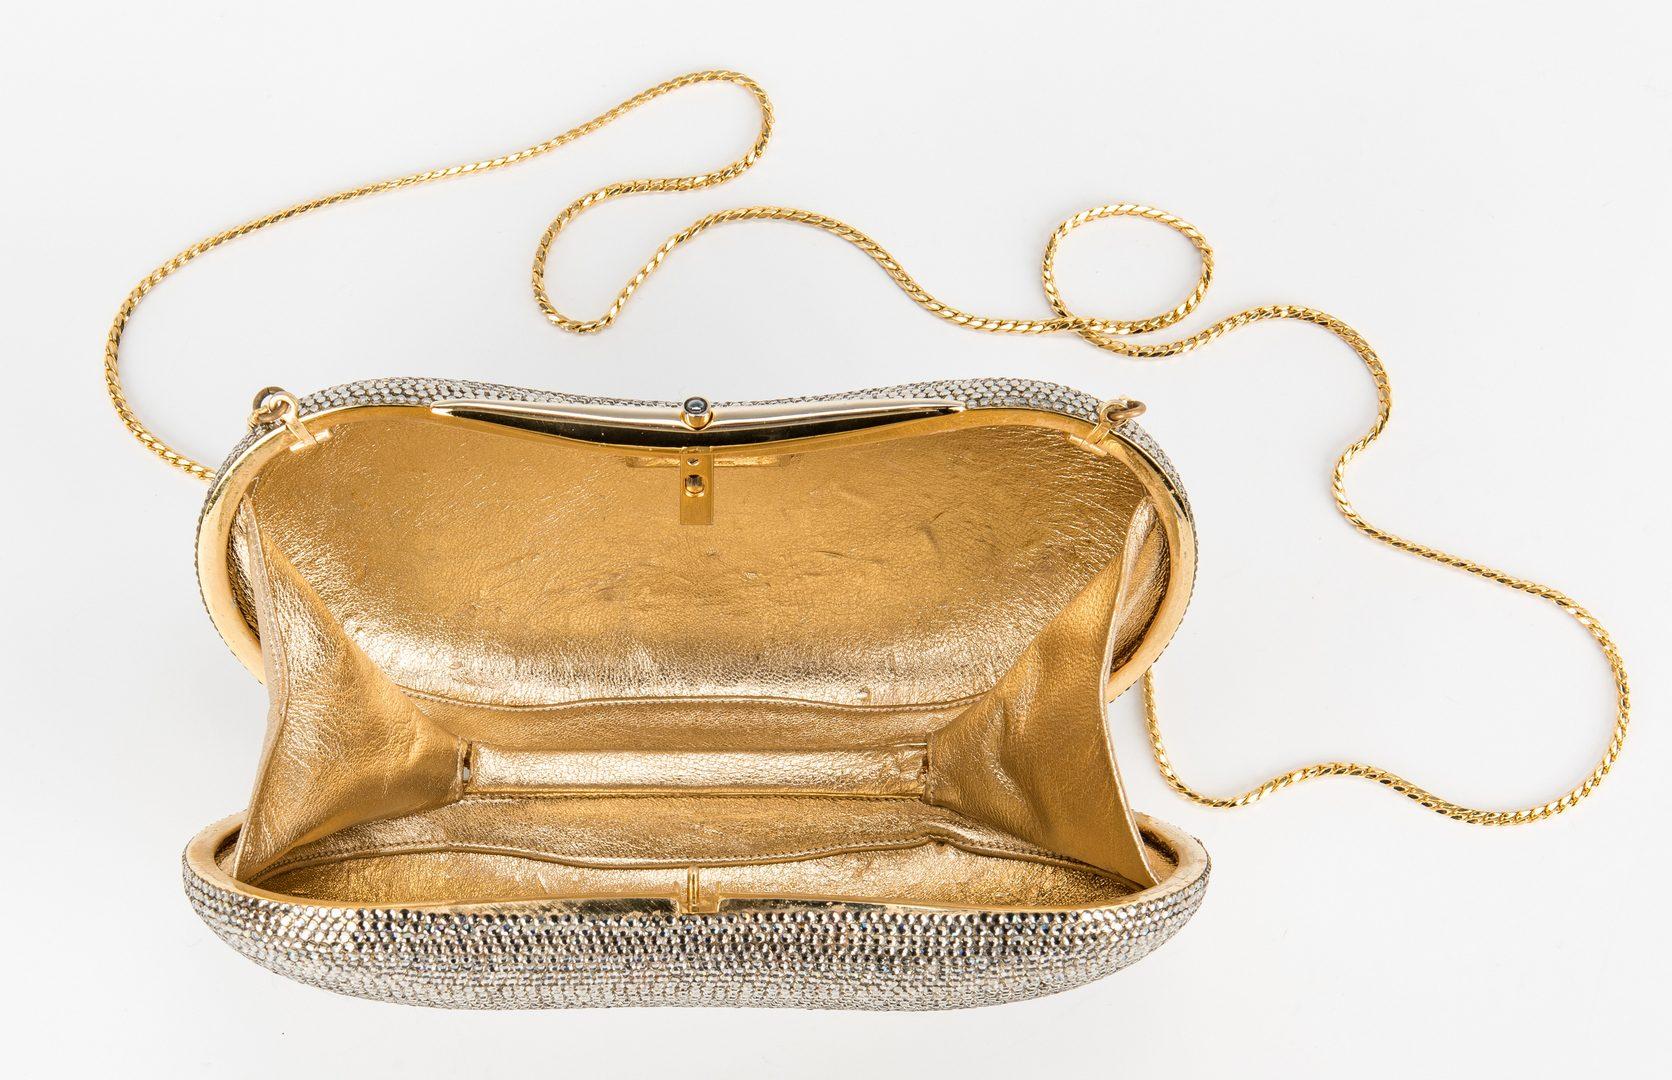 Lot 423: 2 Judith Leiber Bags